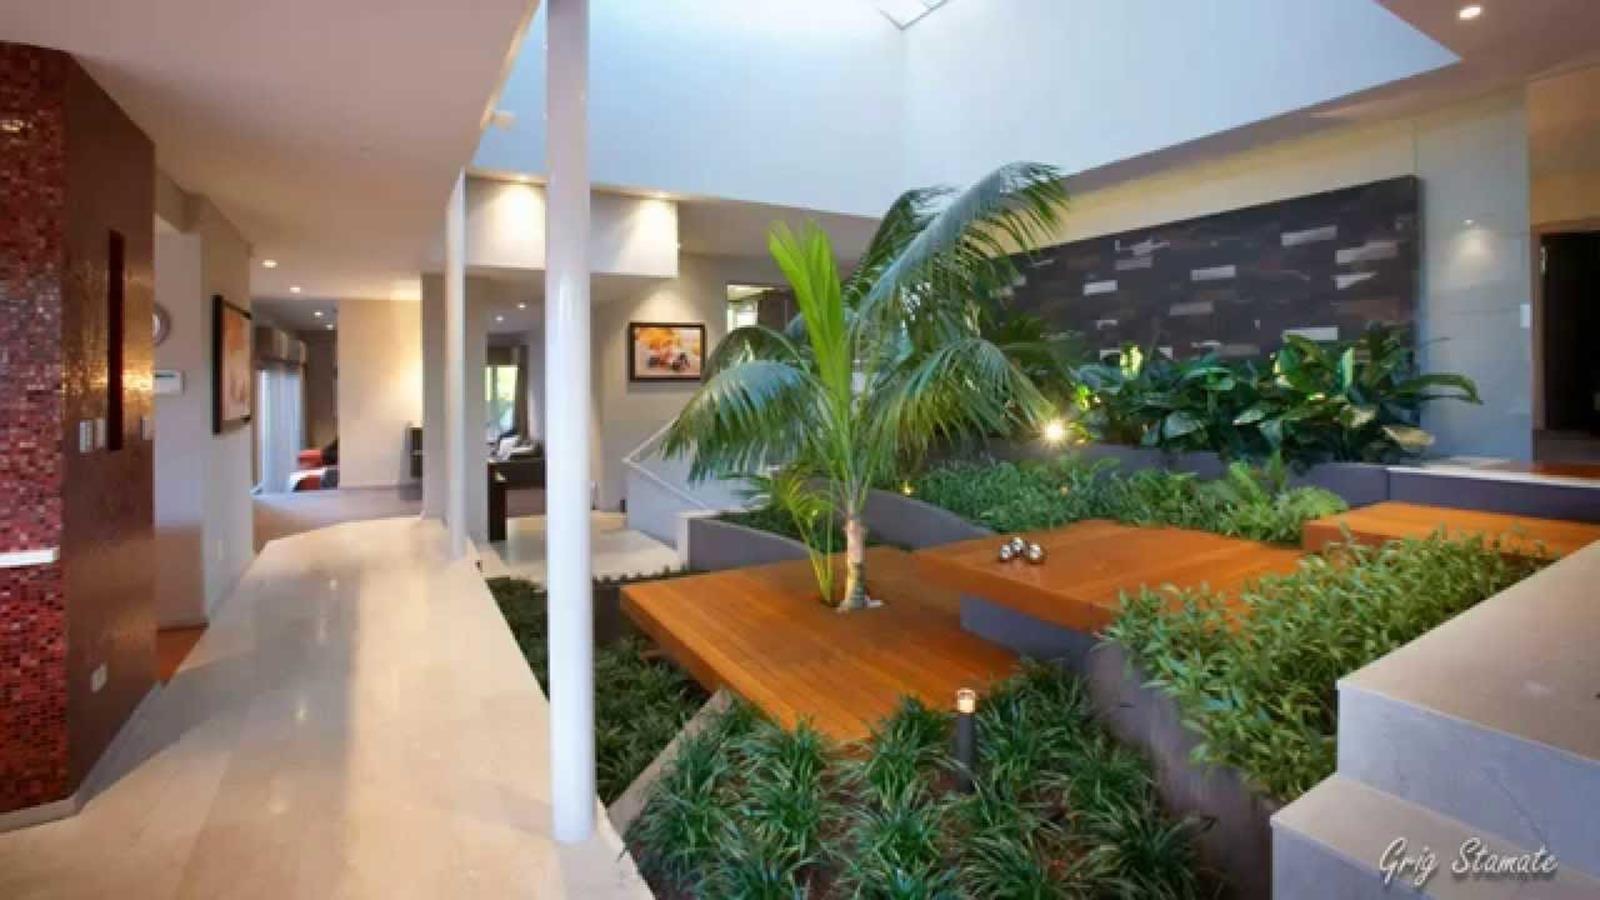 Home garden style   Greeny Indoor Garden Style Decor Design Ideas  Gardening Indoors